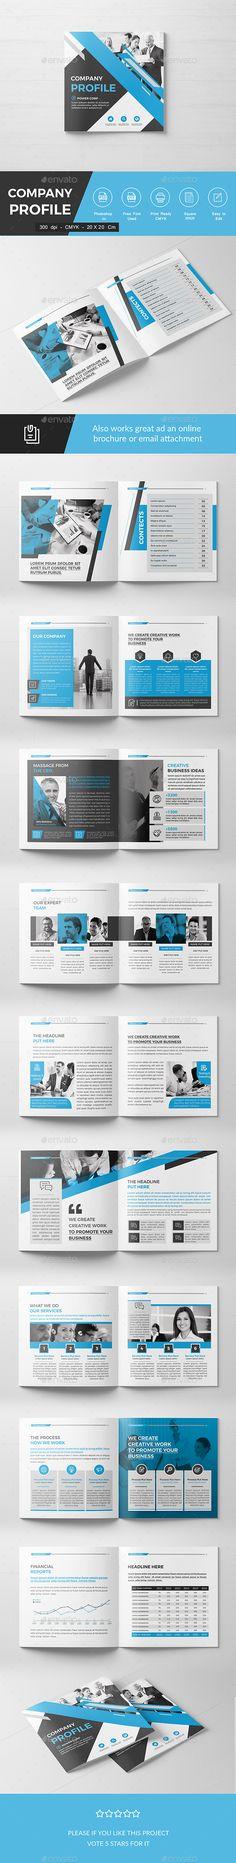 Square Company Brochure - Corporate #Brochures Download here: https://graphicriver.net/item/square-company-brochure/19596253?ref=alena994